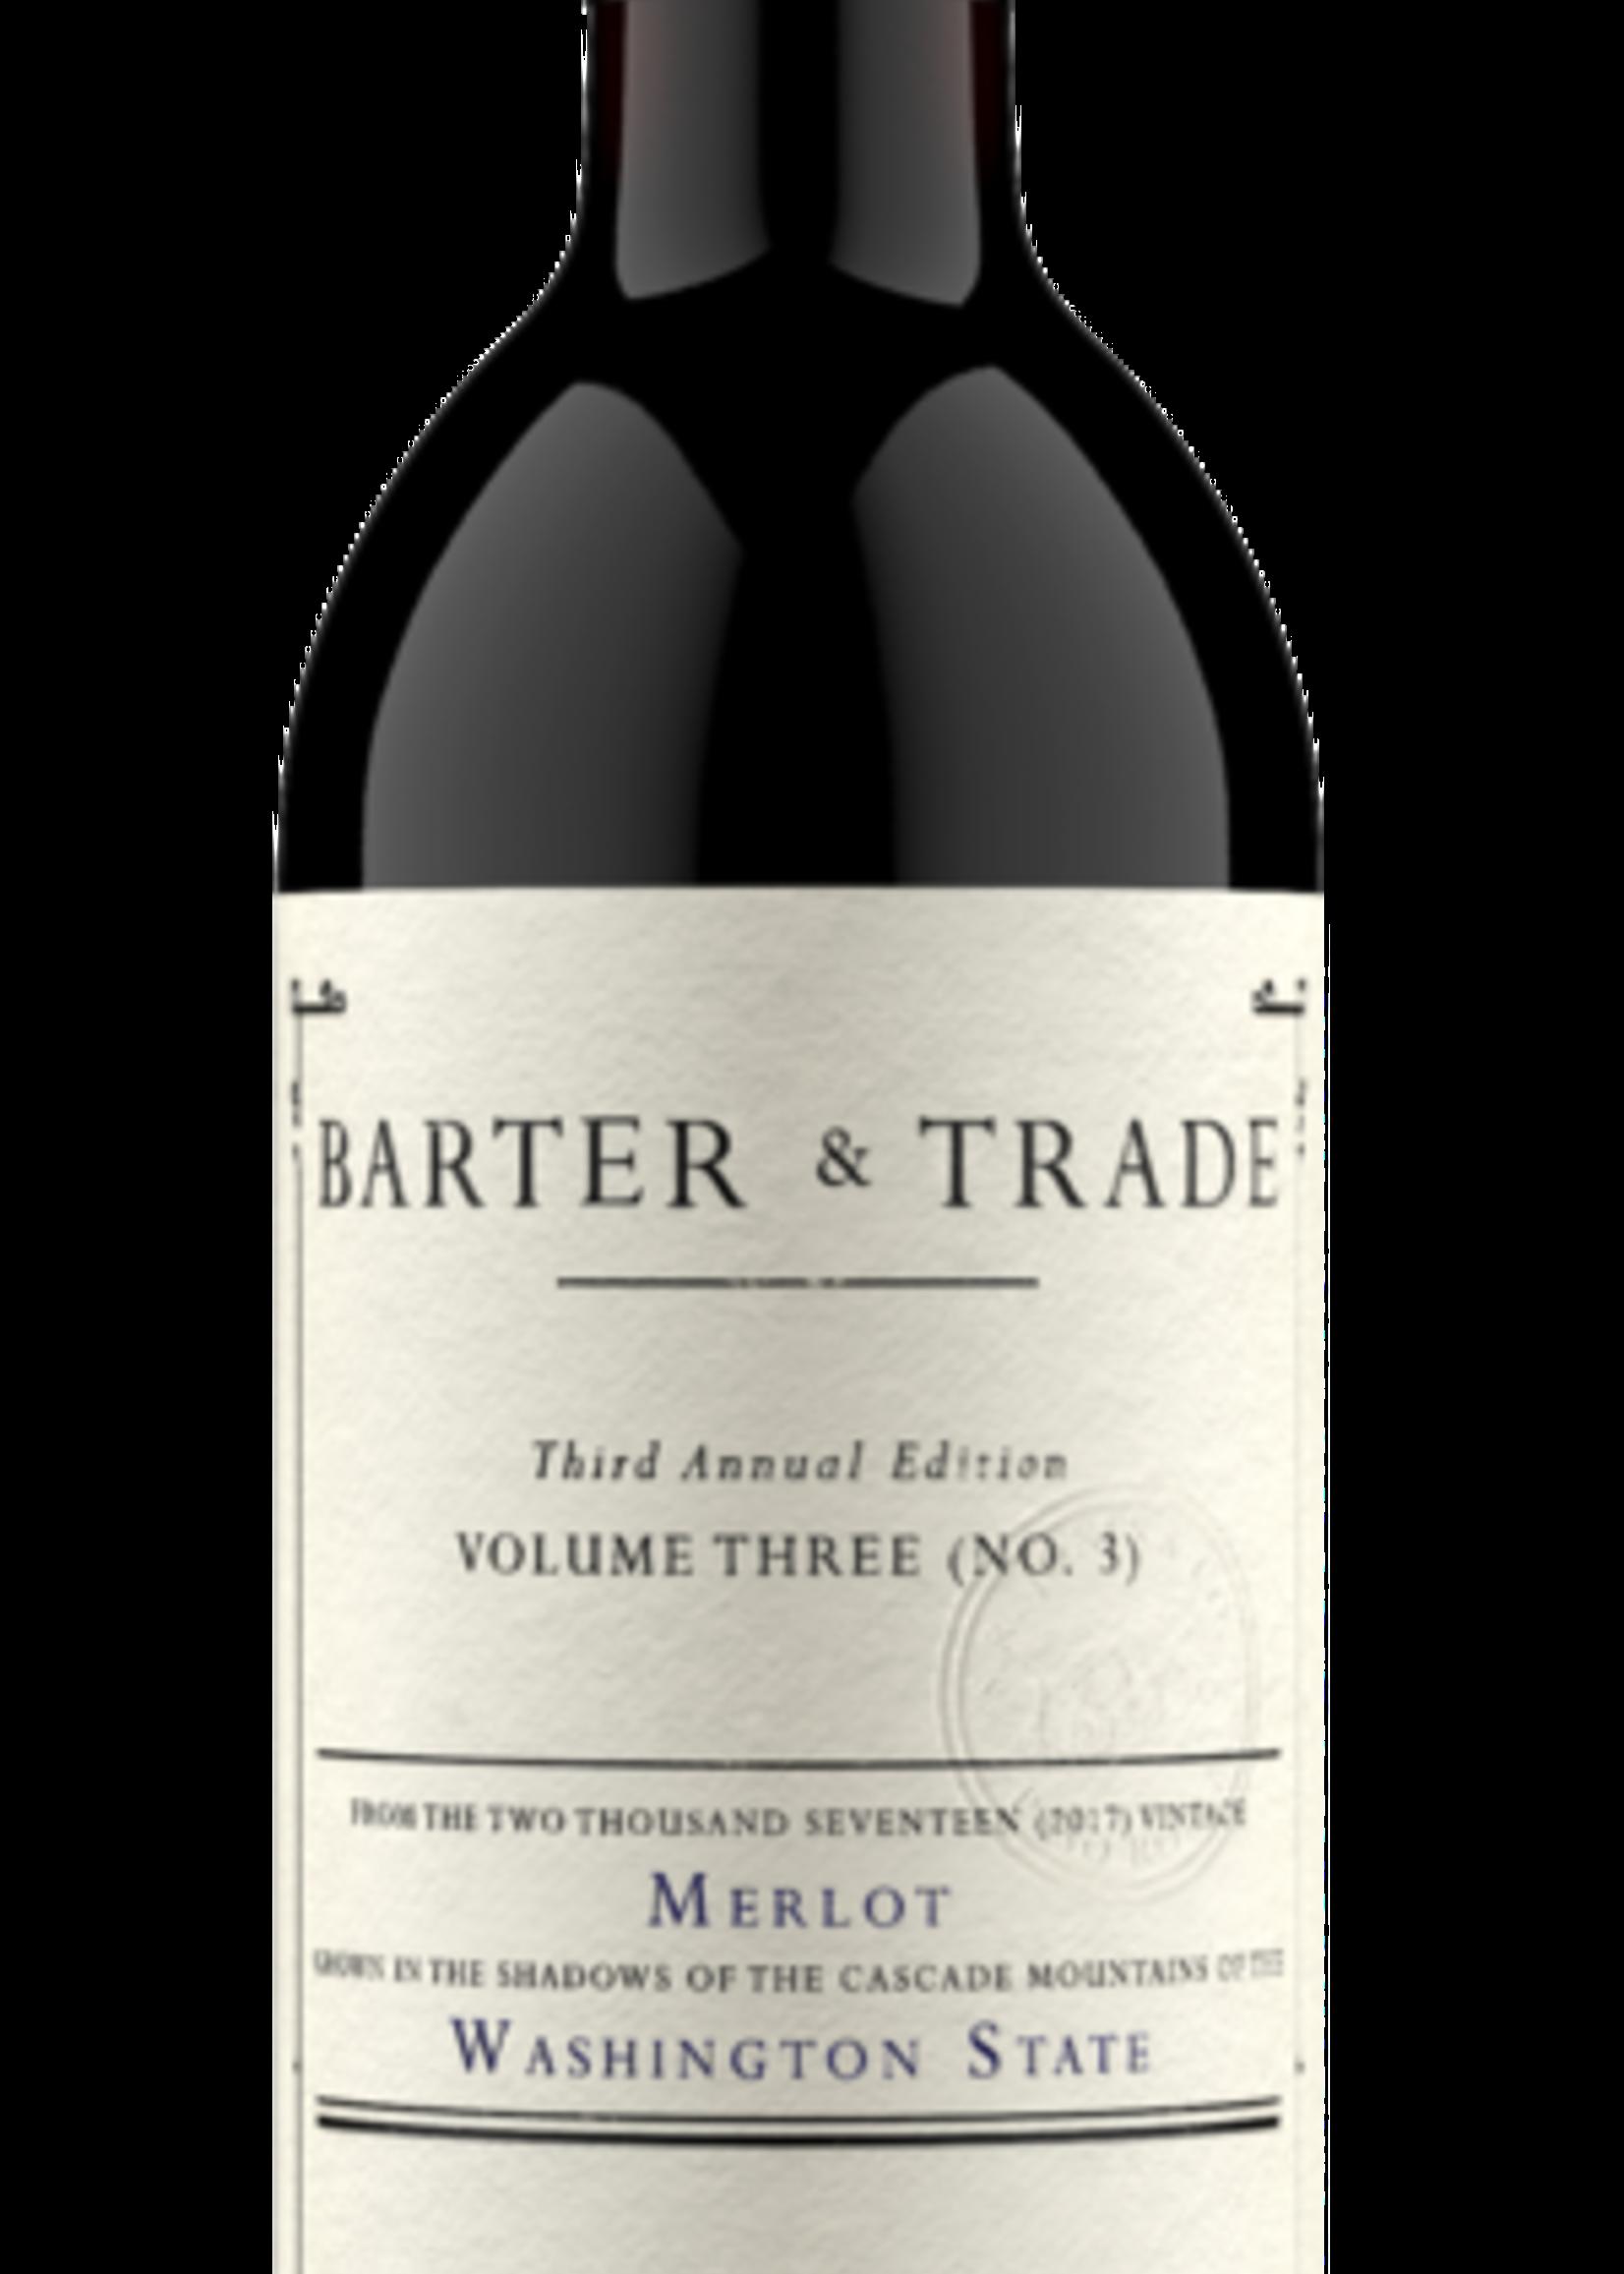 Barter & Trade Merlot